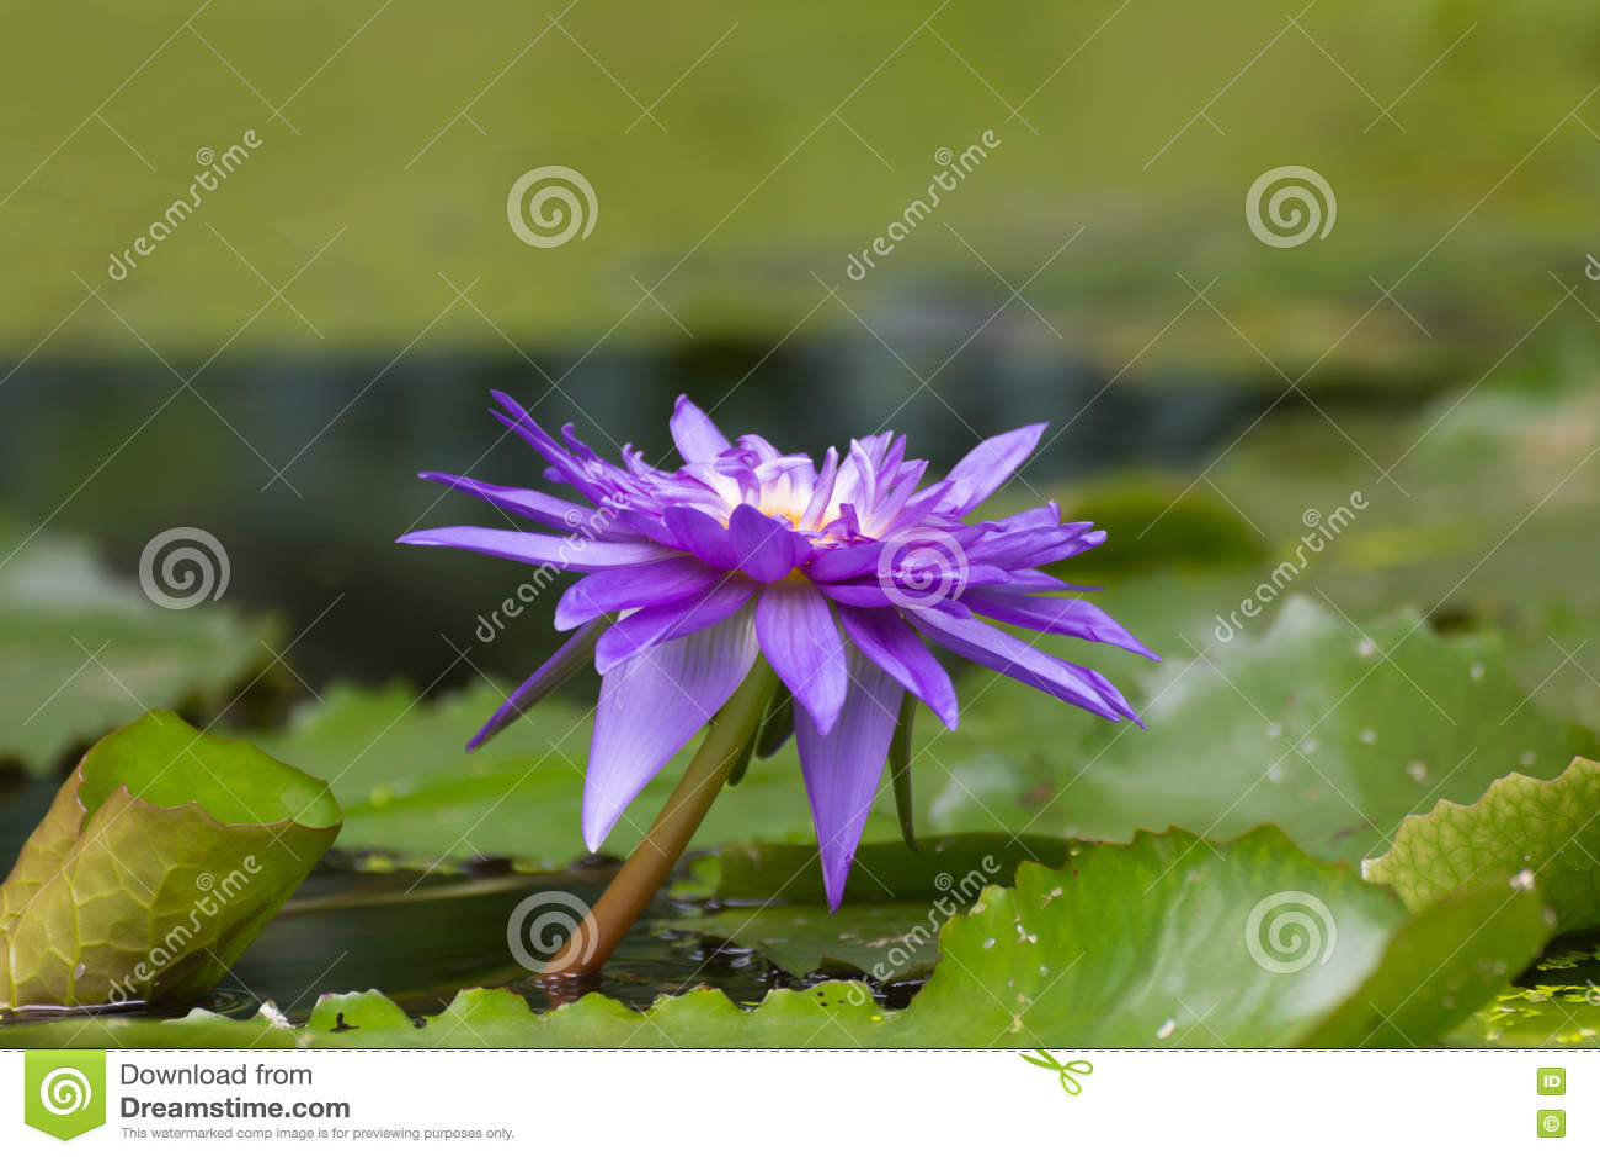 Lotus flower purple color stock photo. Image of colors - 78492044